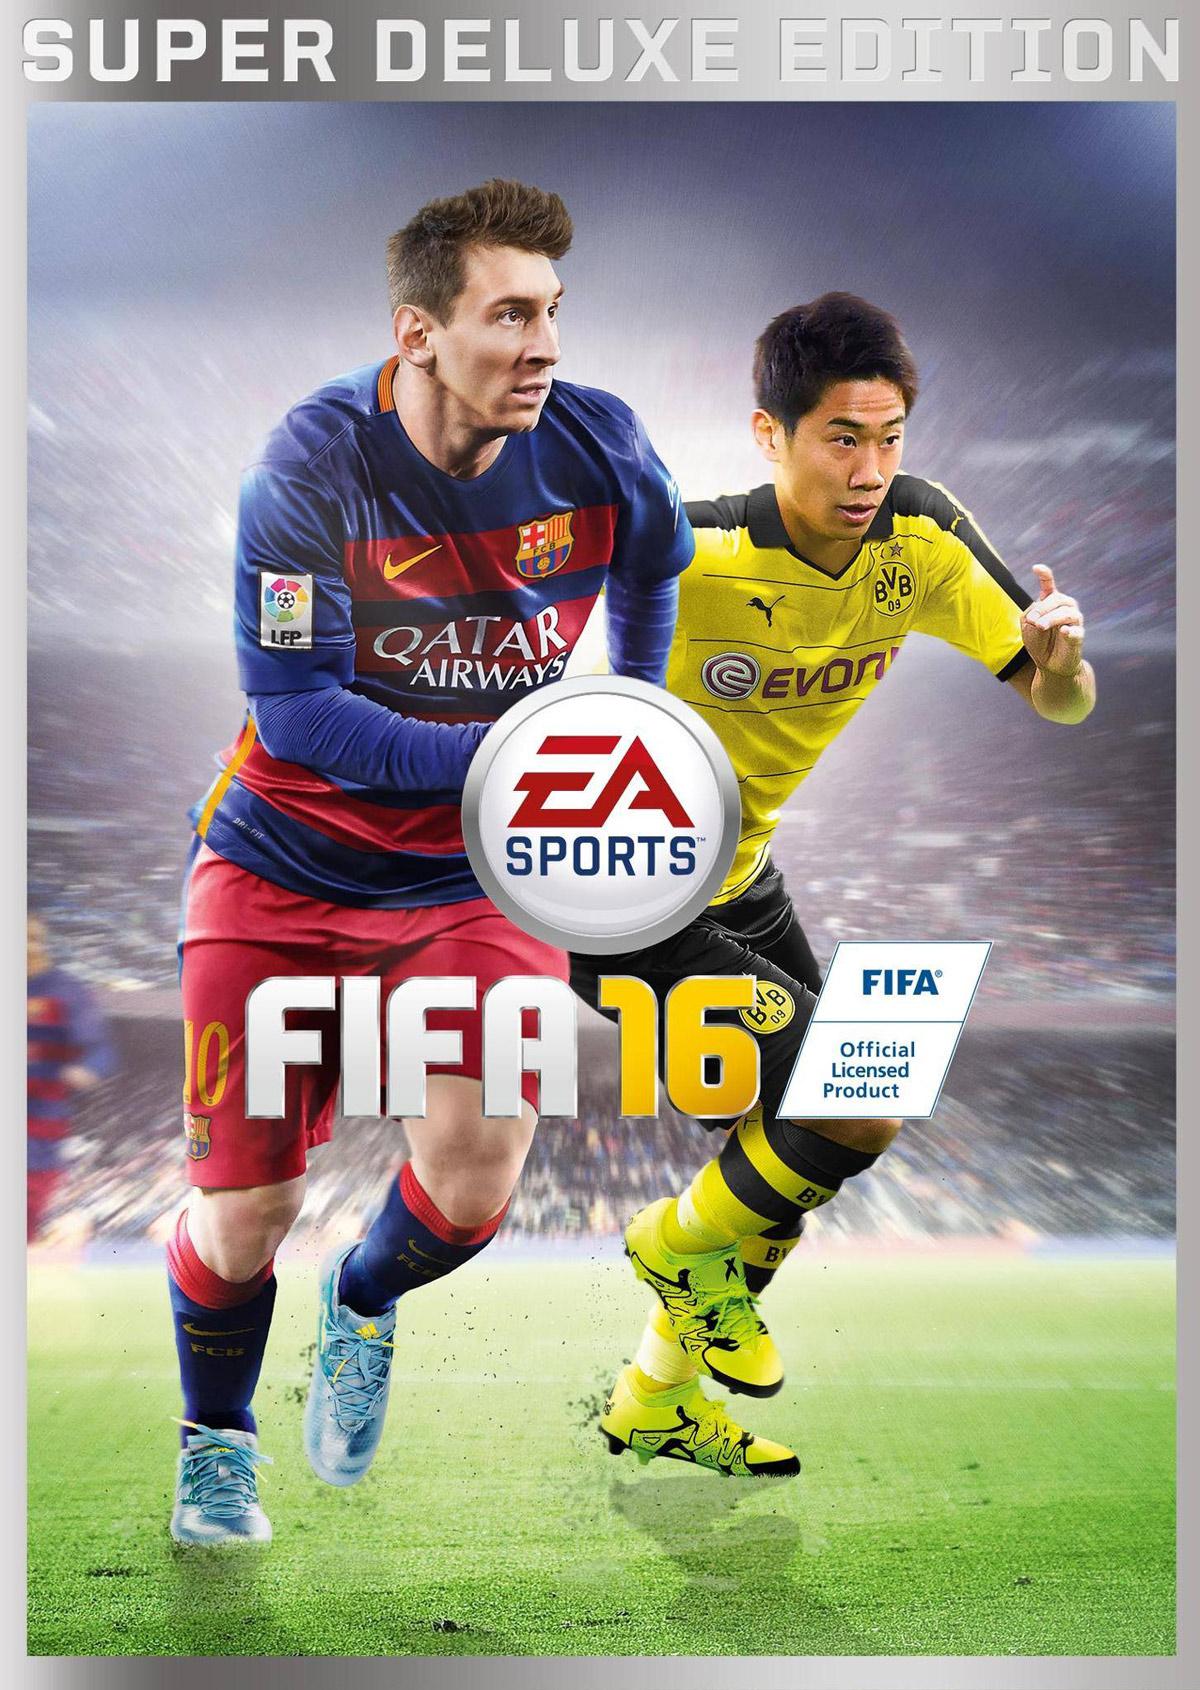 fifa-16-cover-asia